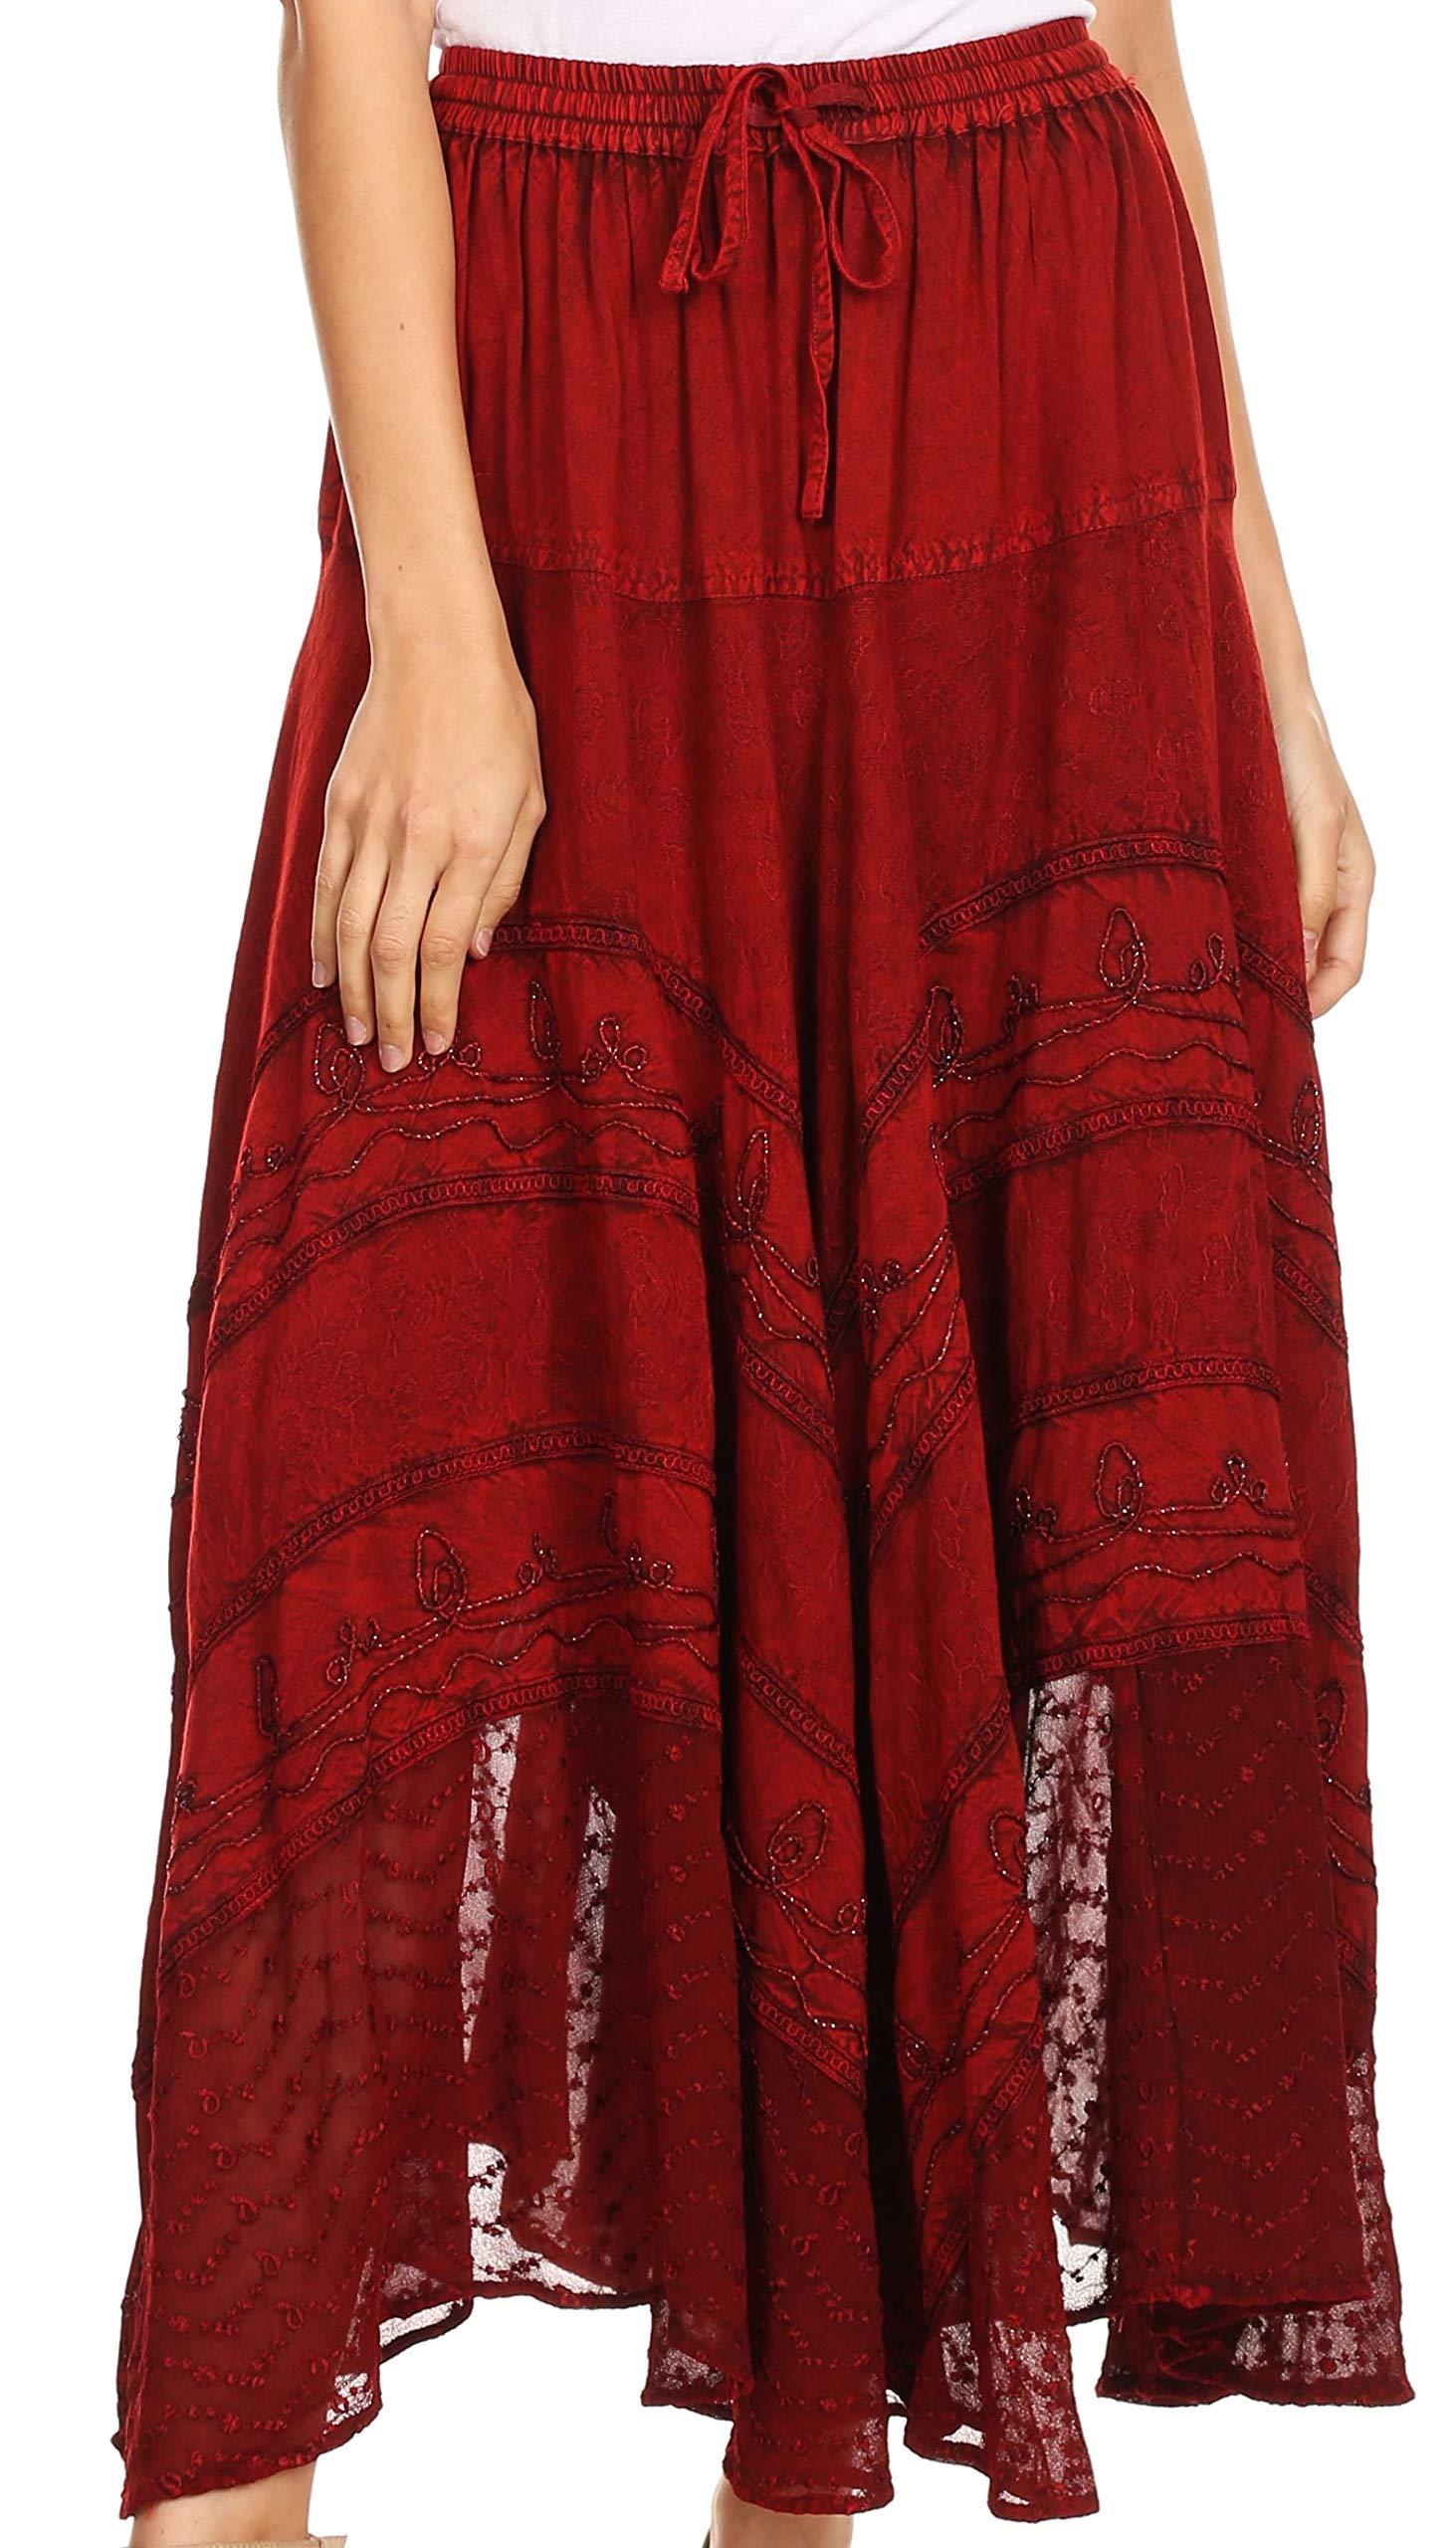 Sakkas 13222 Ivy Maiden Boho Skirt - Cayenne - One Size Regular